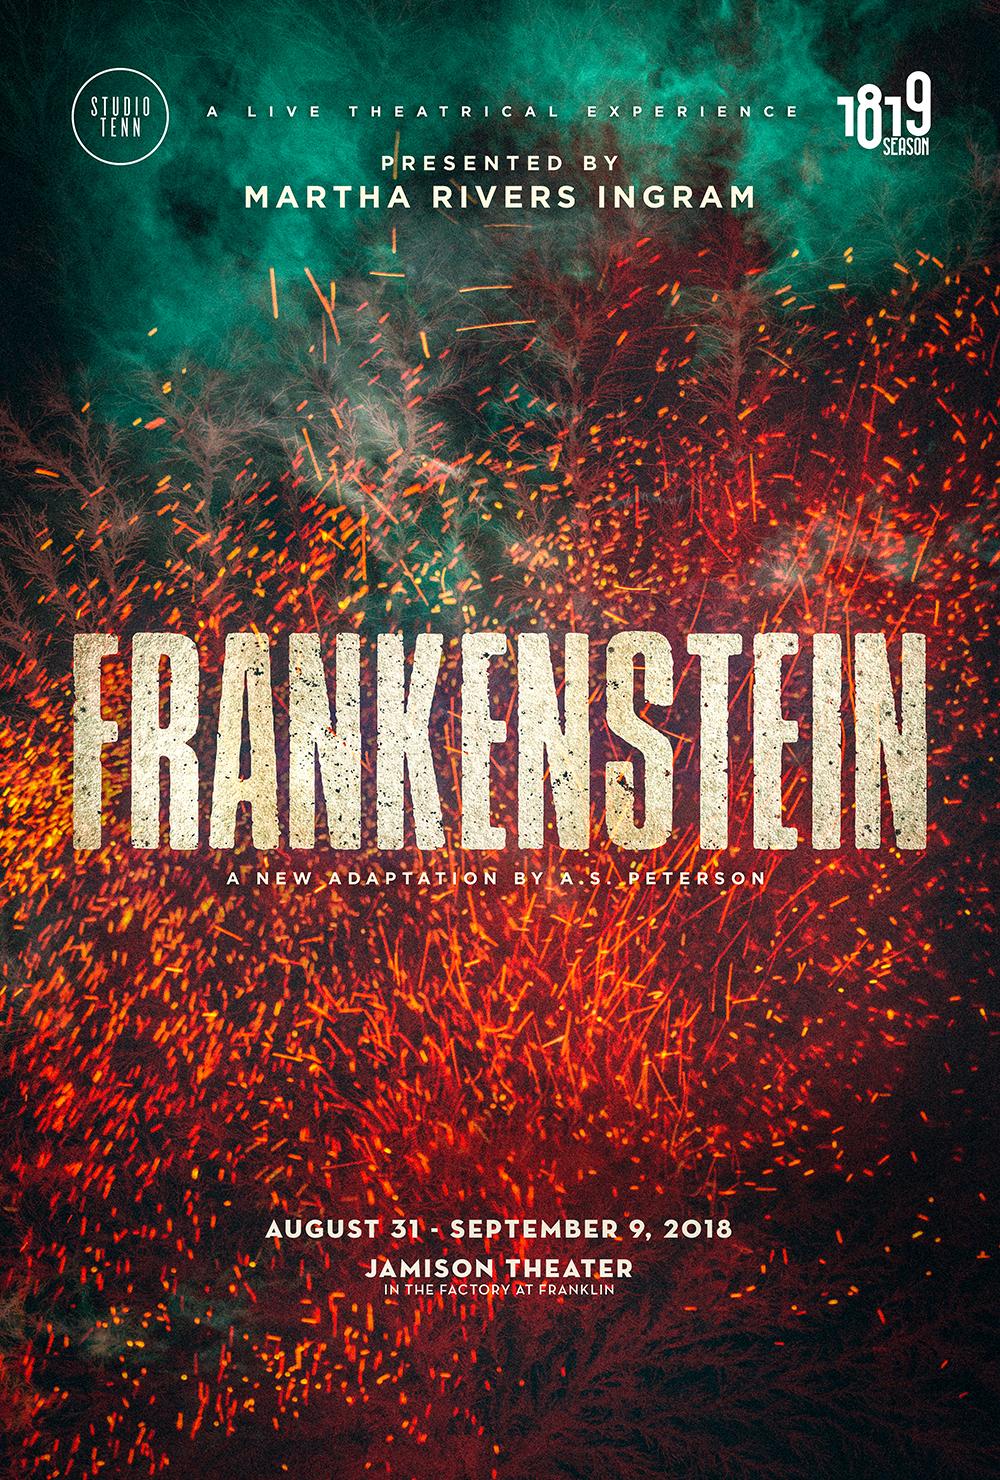 Frankenstein_admat_template2_web.JPG